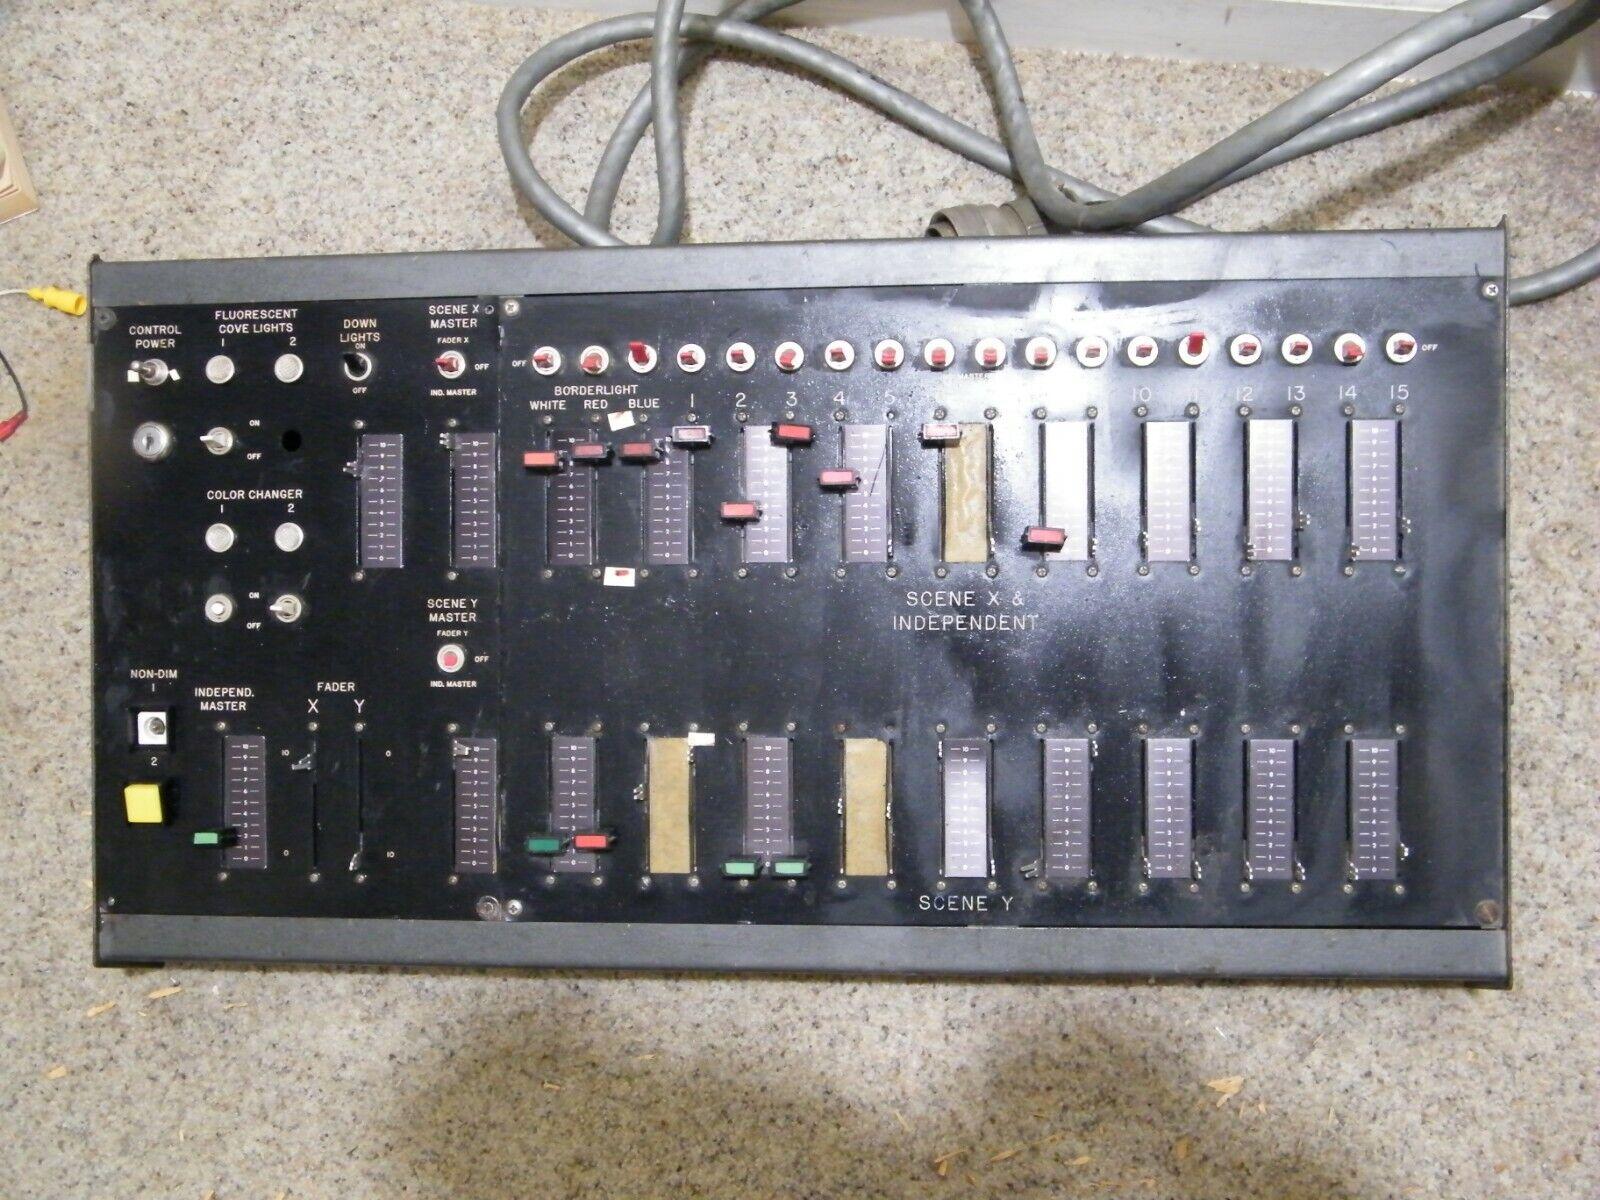 Professionelle DJ Stage Theater Lighting Controller Light Board Controls Spotlight